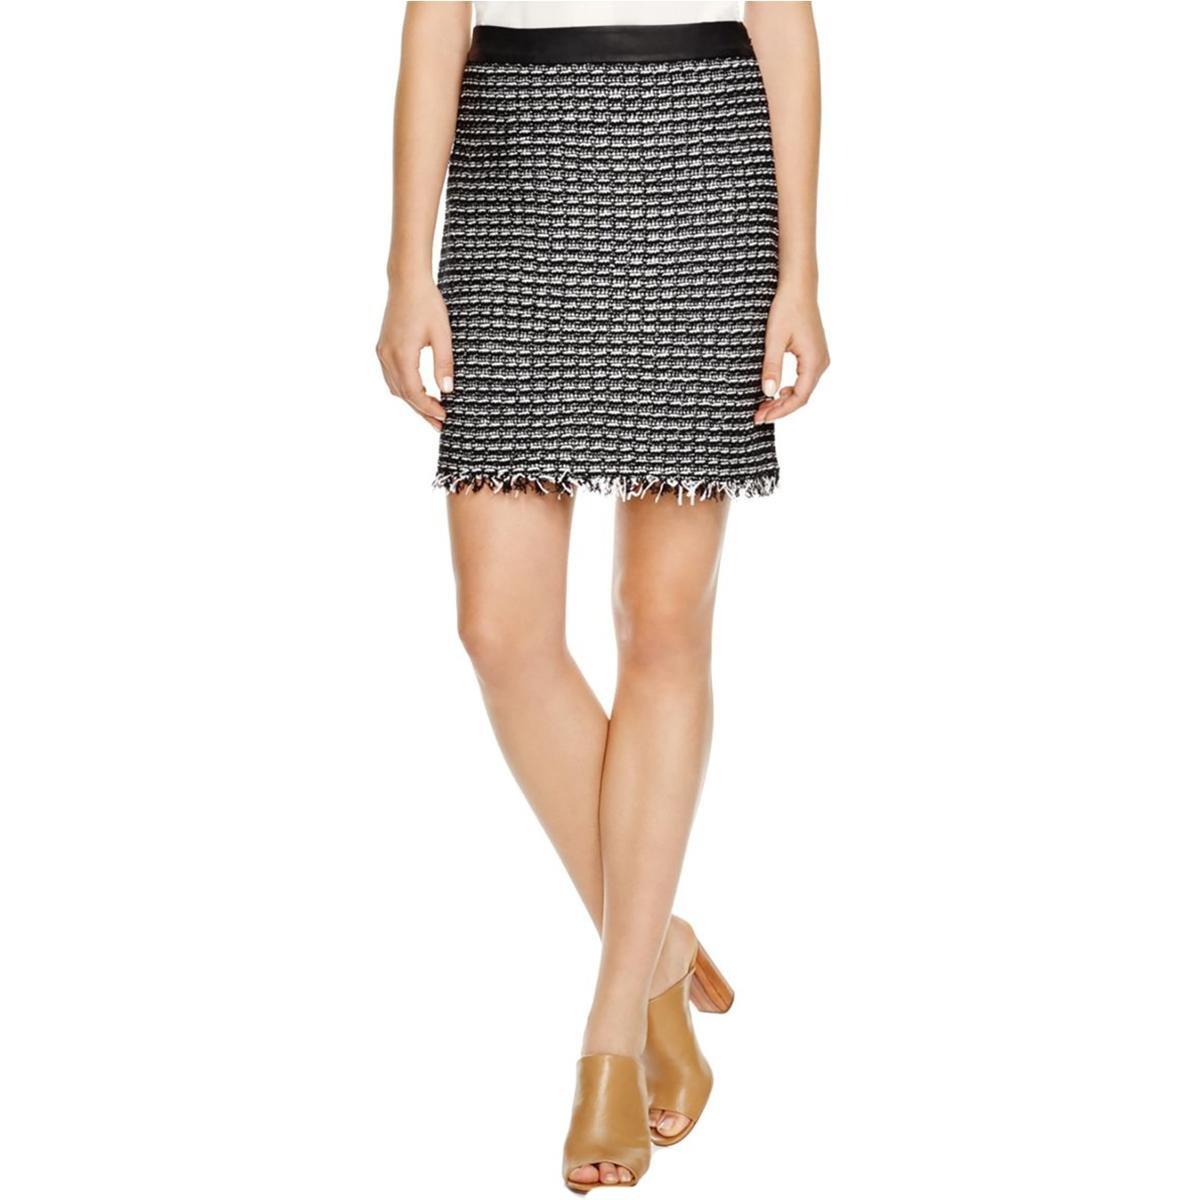 Tory Burch Womens Raffia Tweed Fringe A-Line Skirt B/W 4